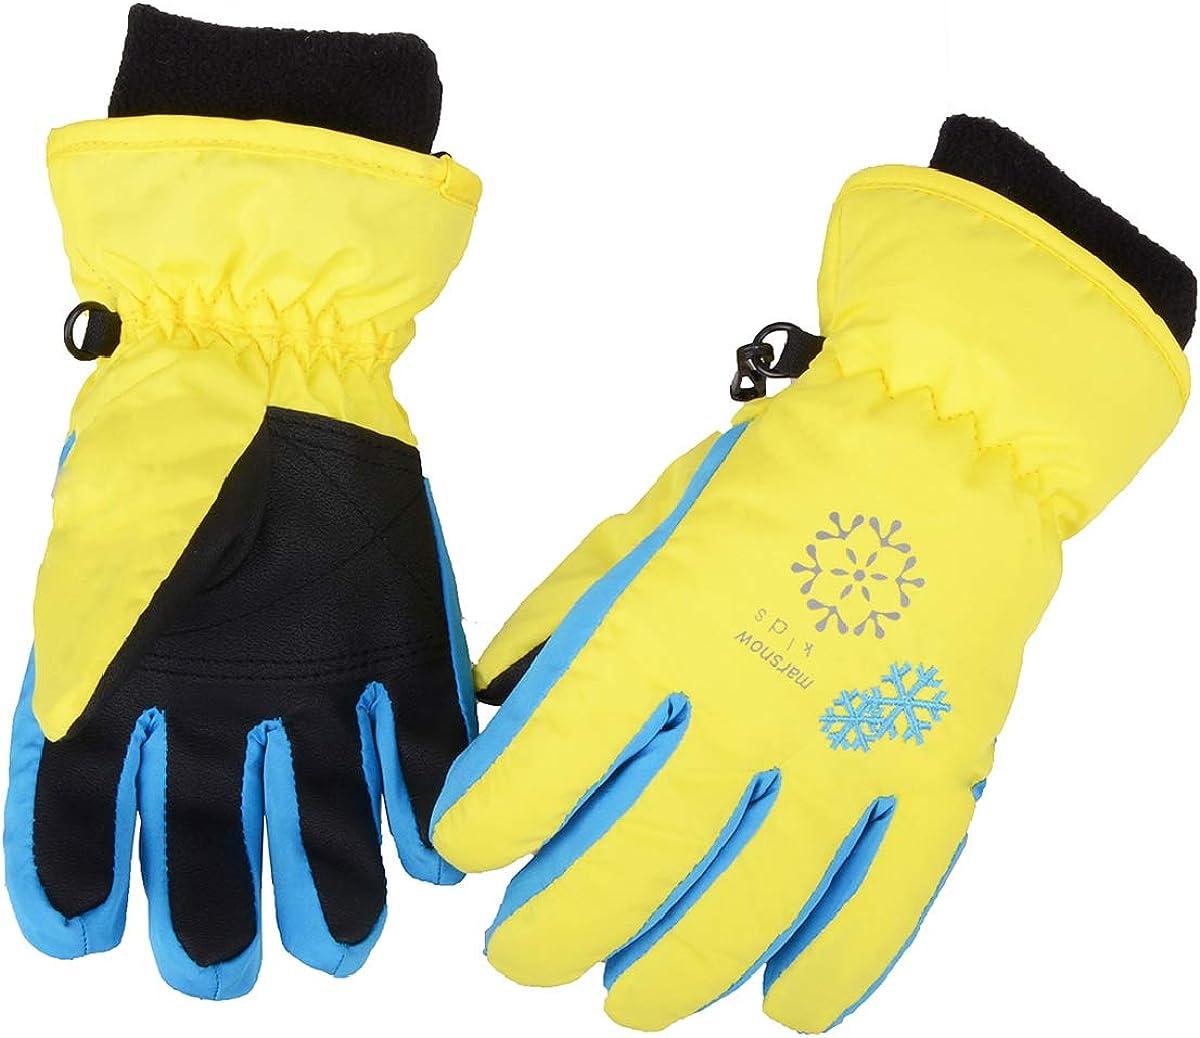 Ski Snowboard Full Finger Windproof Cycling Bicycle Gloves Winter Warm Fleece